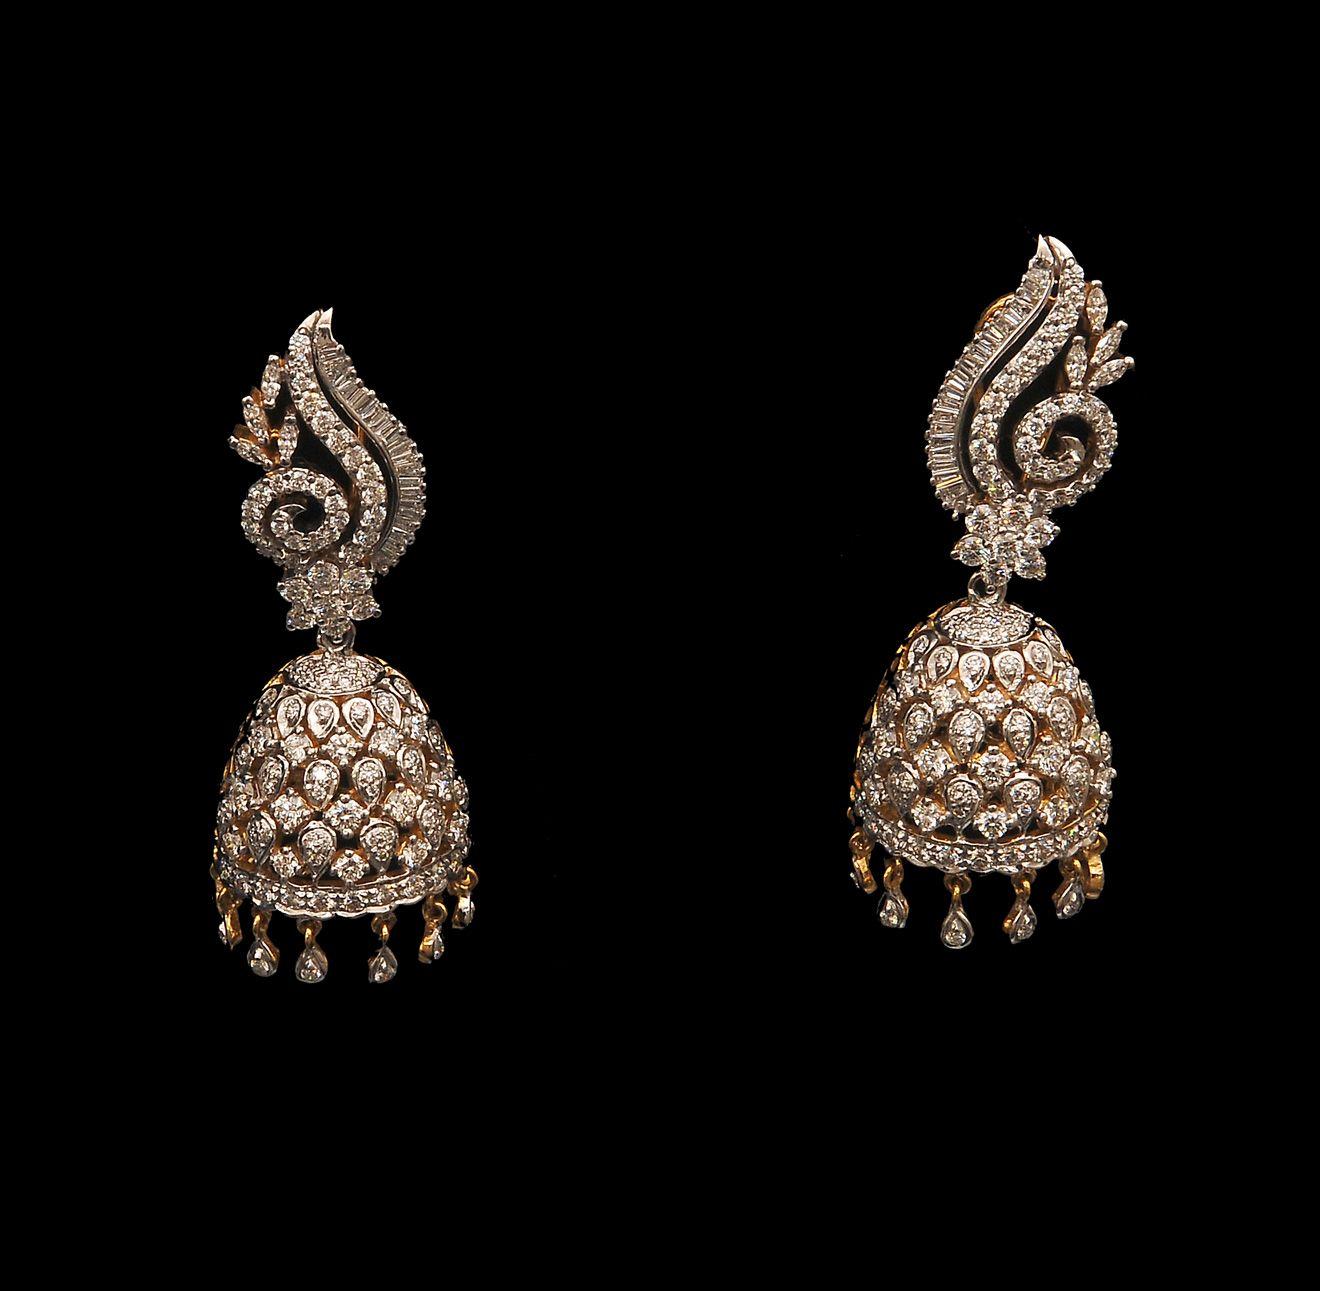 Newmodelgoldnecklacemalabargold98 Diamond Earrings